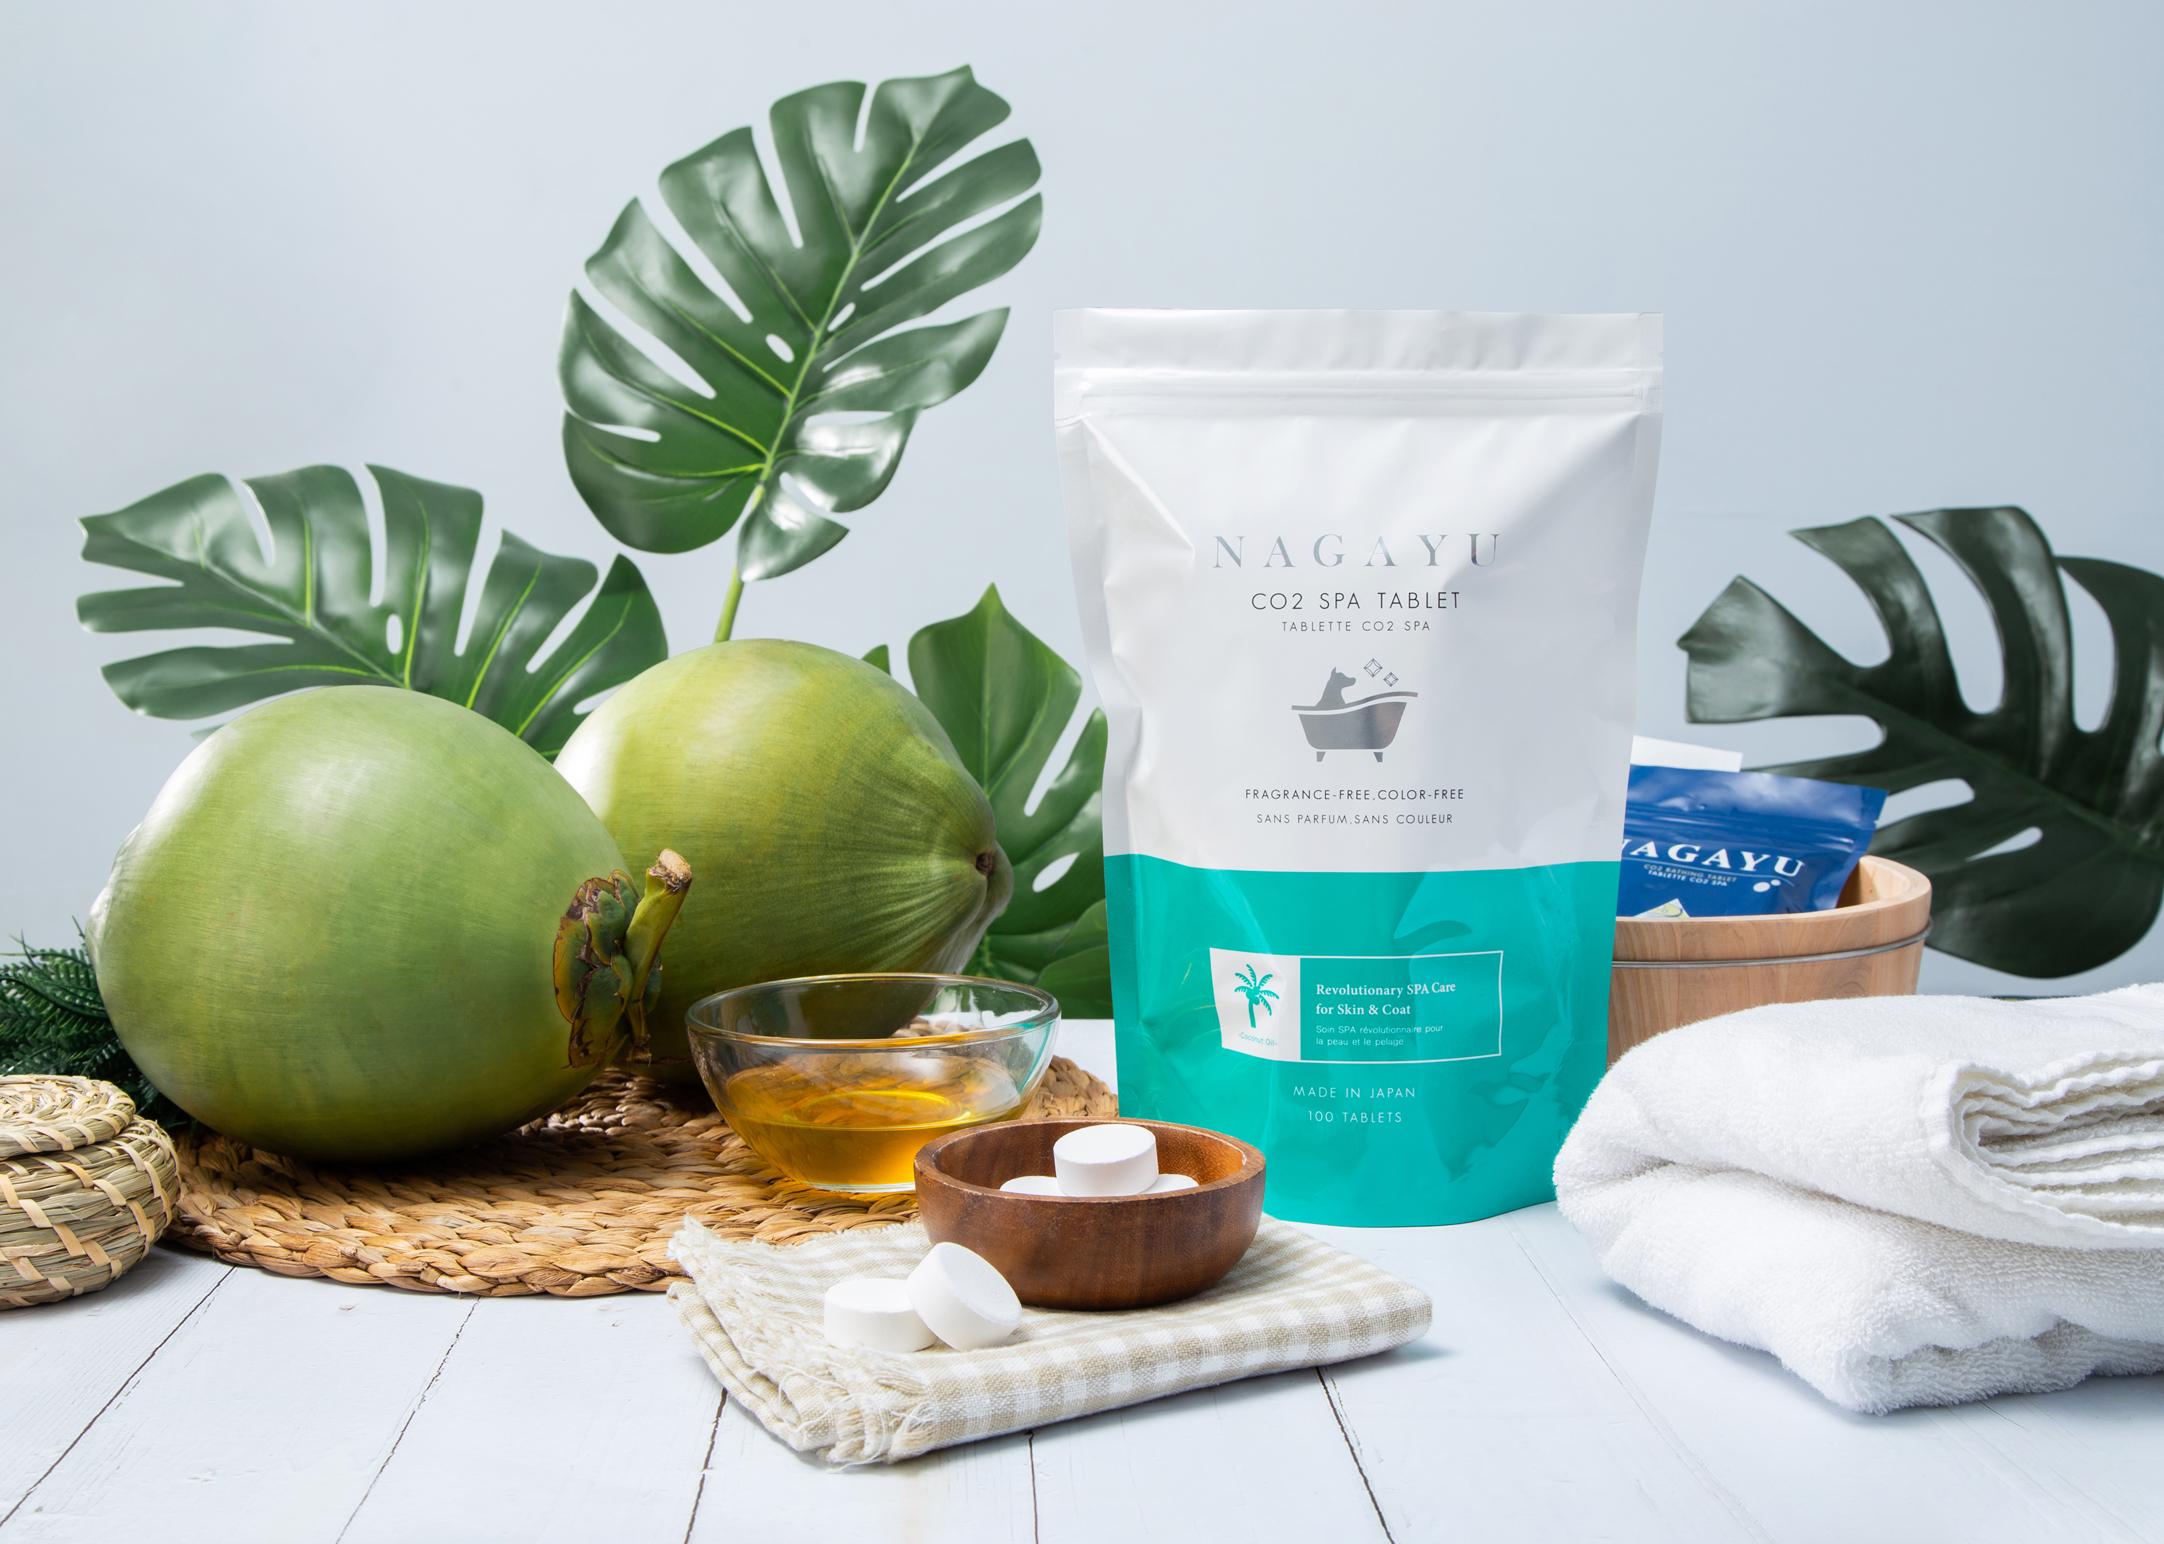 Nagayu Koolzuurhoudende Spa Tabletten 100stuks - Kokosolie